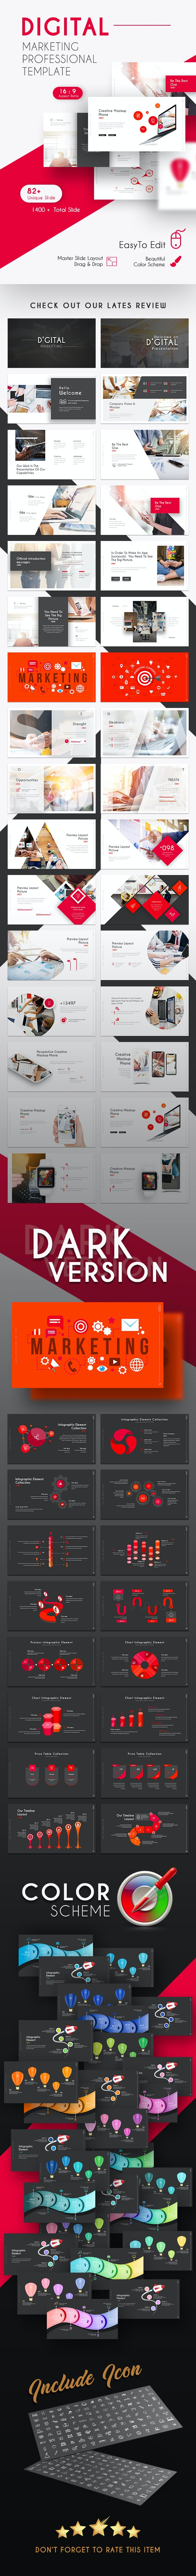 Digital Marketing Professional Presentation Template - PowerPoint Templates Presentation Templates